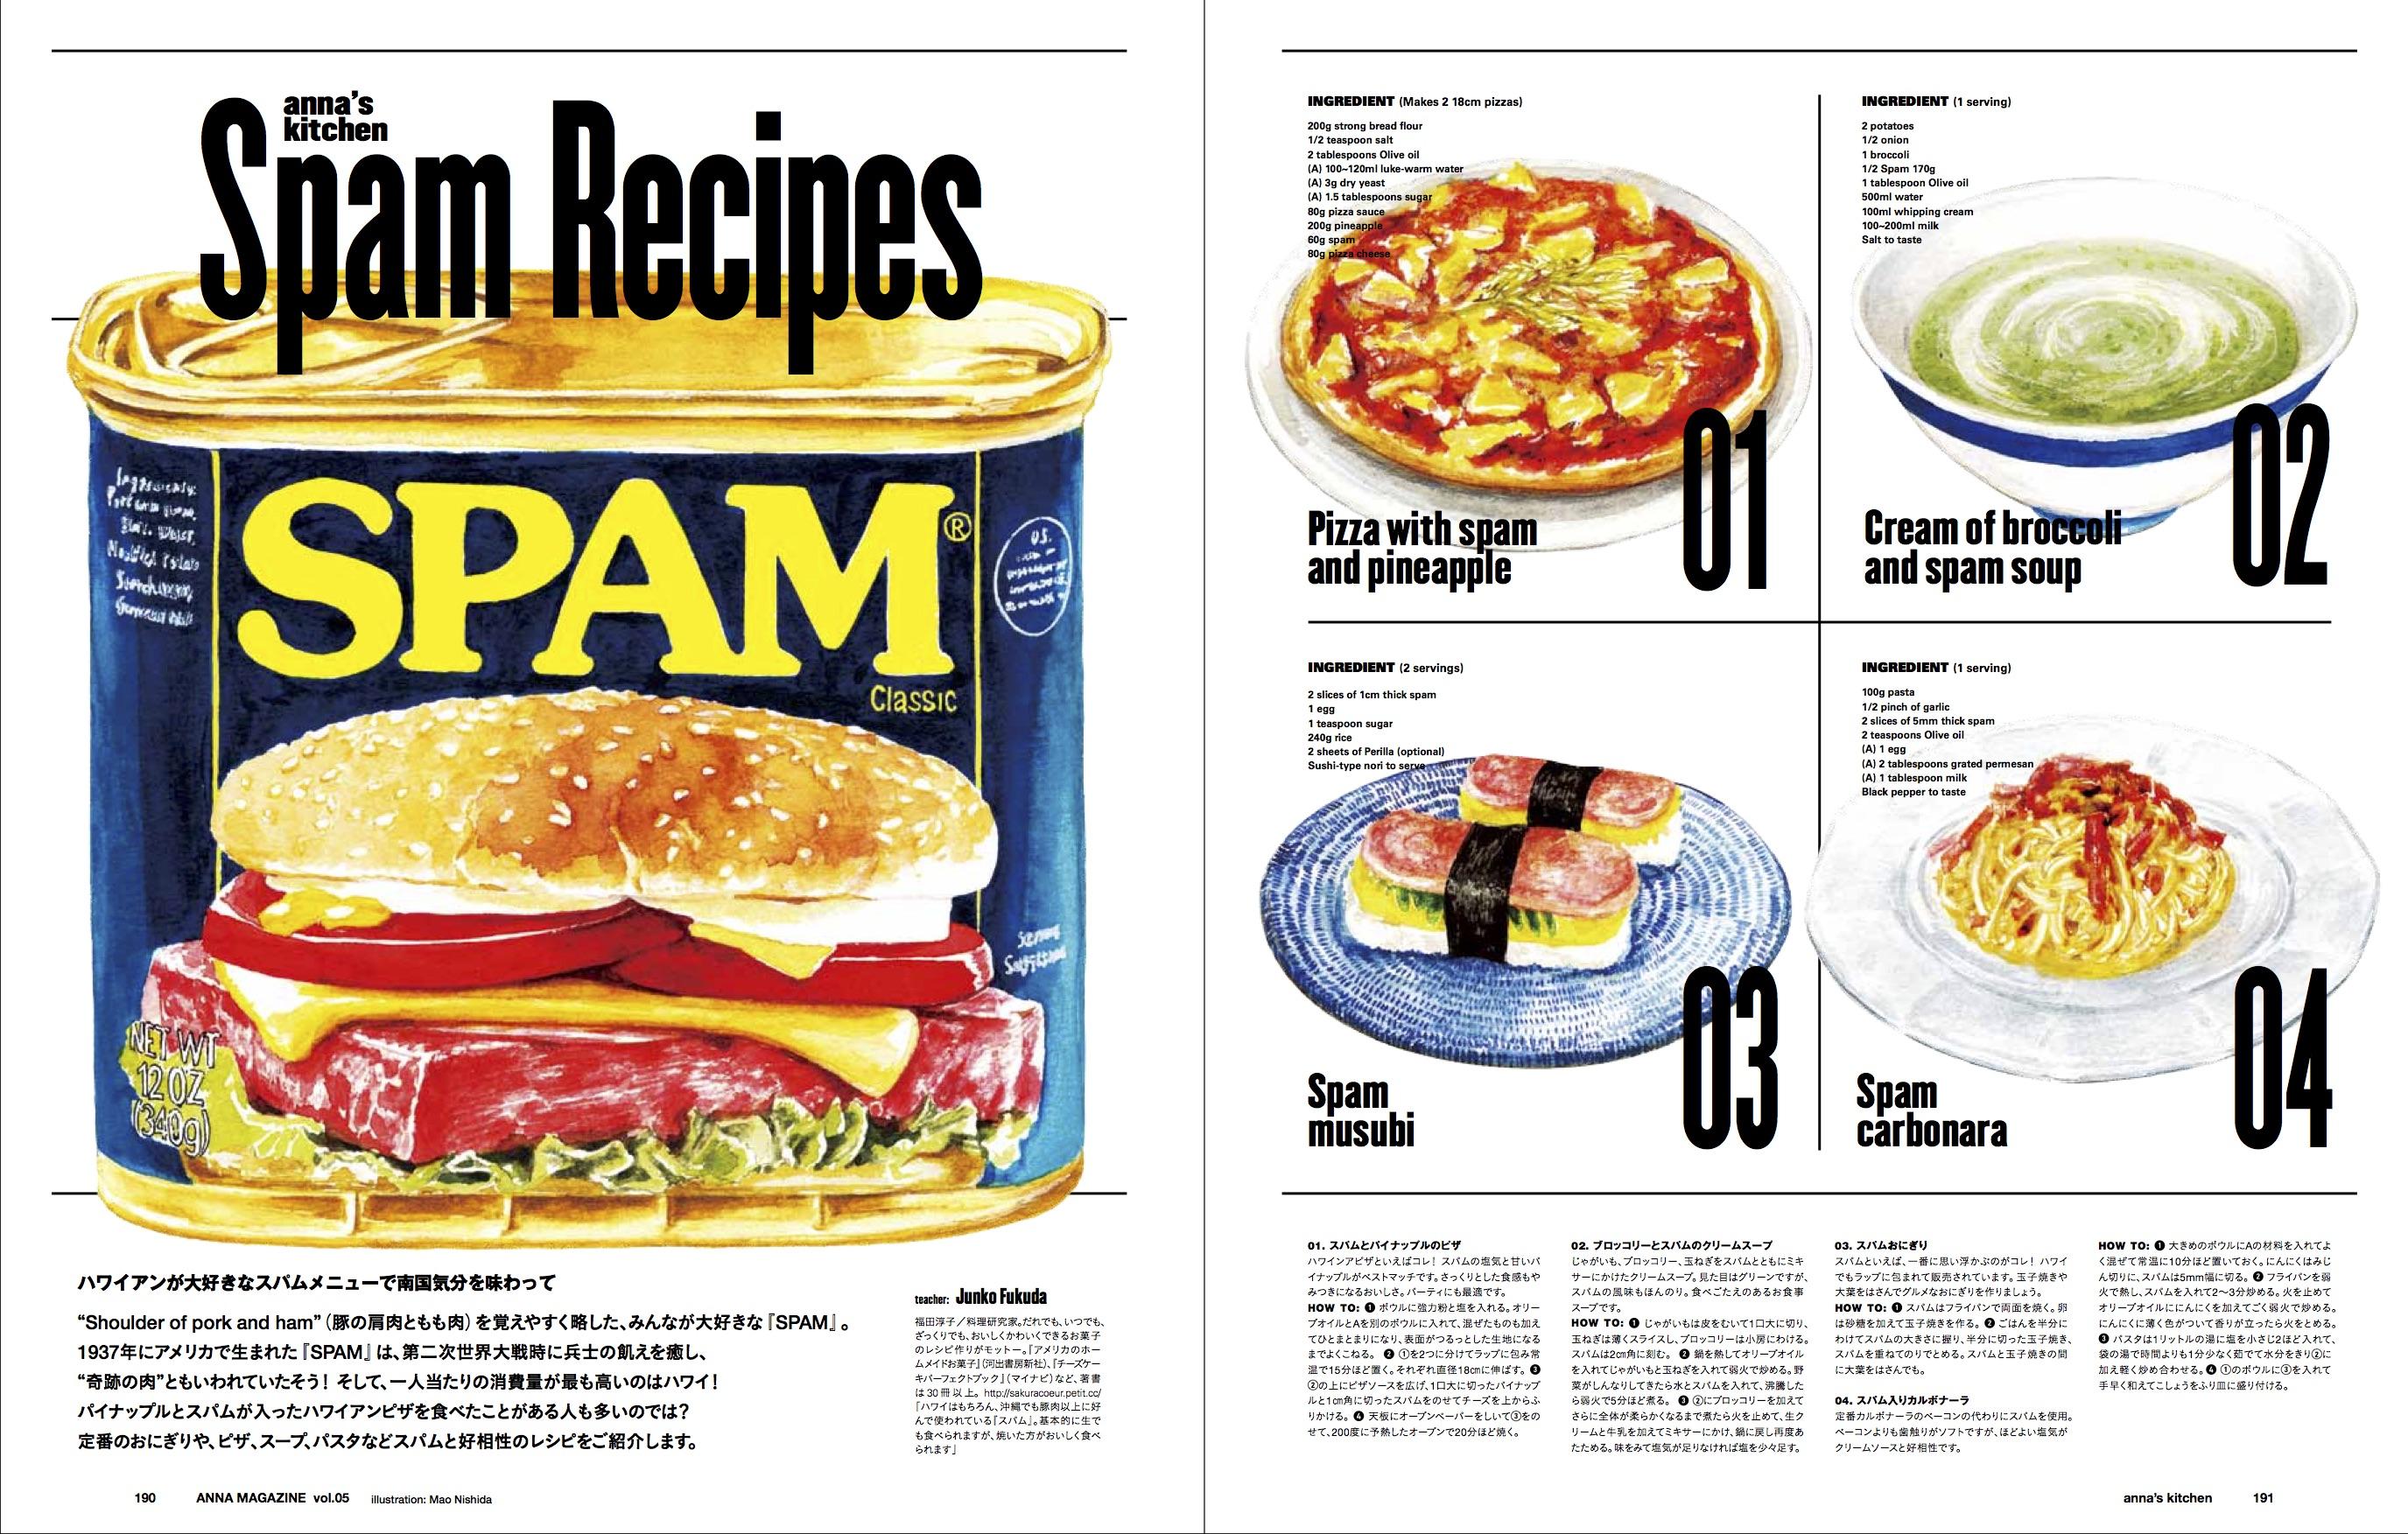 anna magazine Vol.5 P54